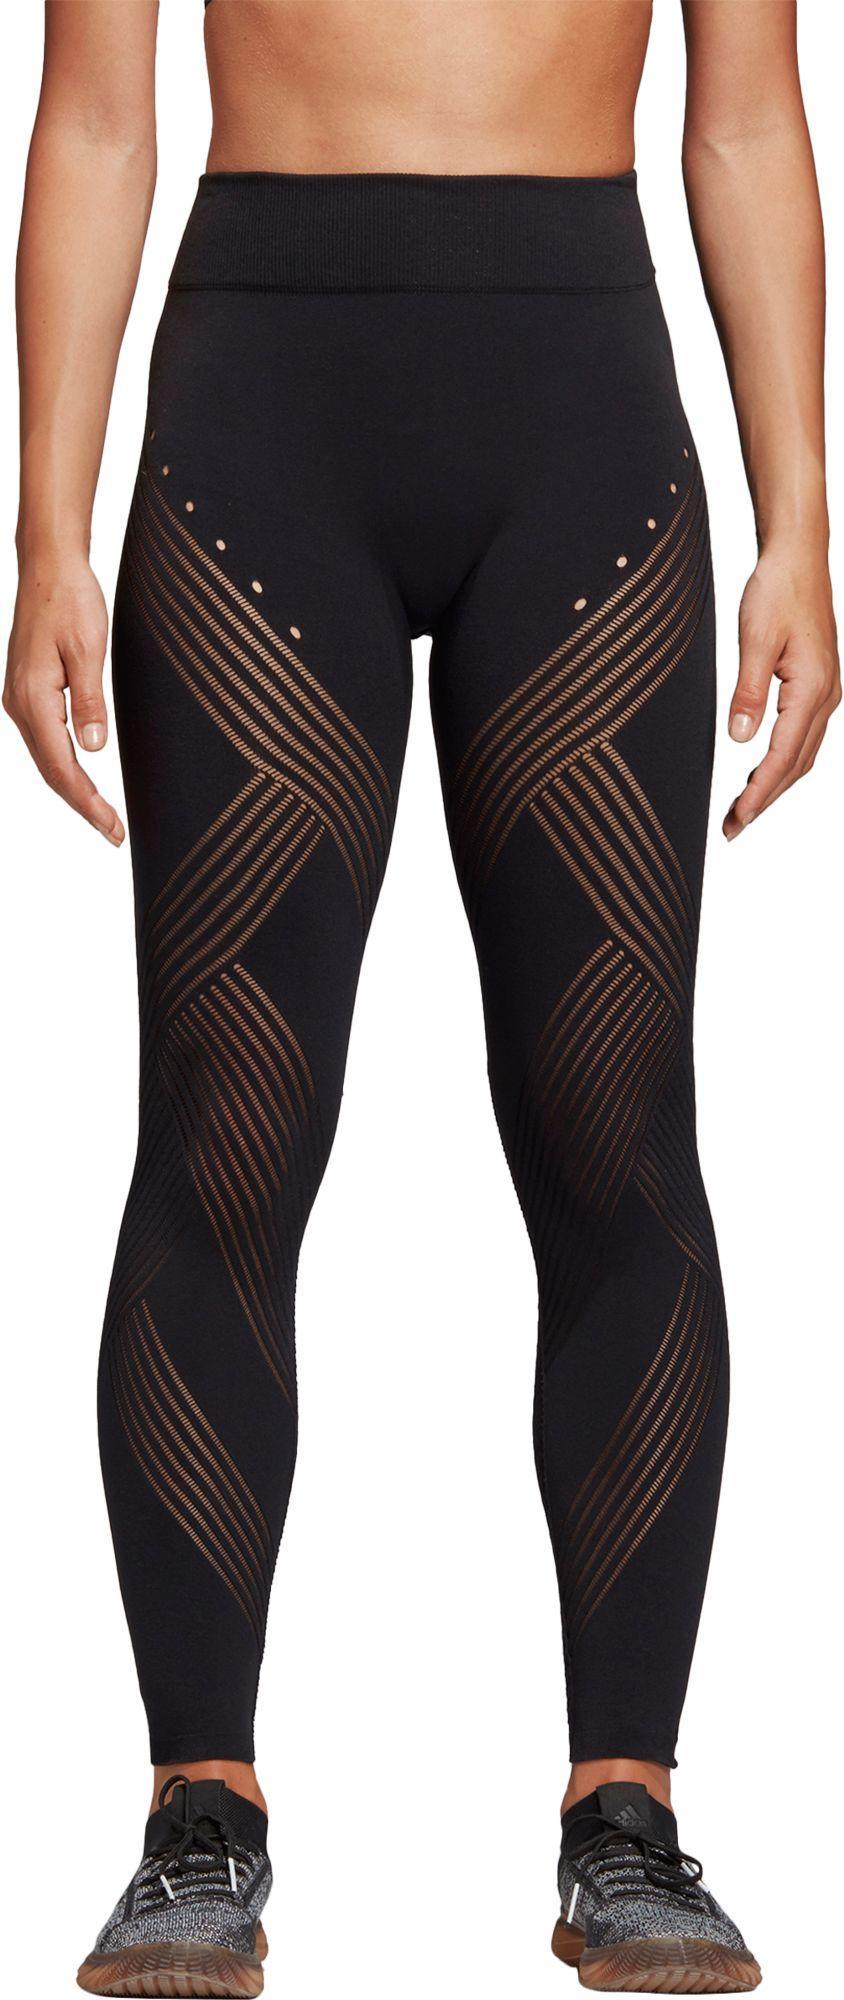 04603e5a827 Lyst - adidas Warp Knit High-rise 7/8th Length Tights in Black